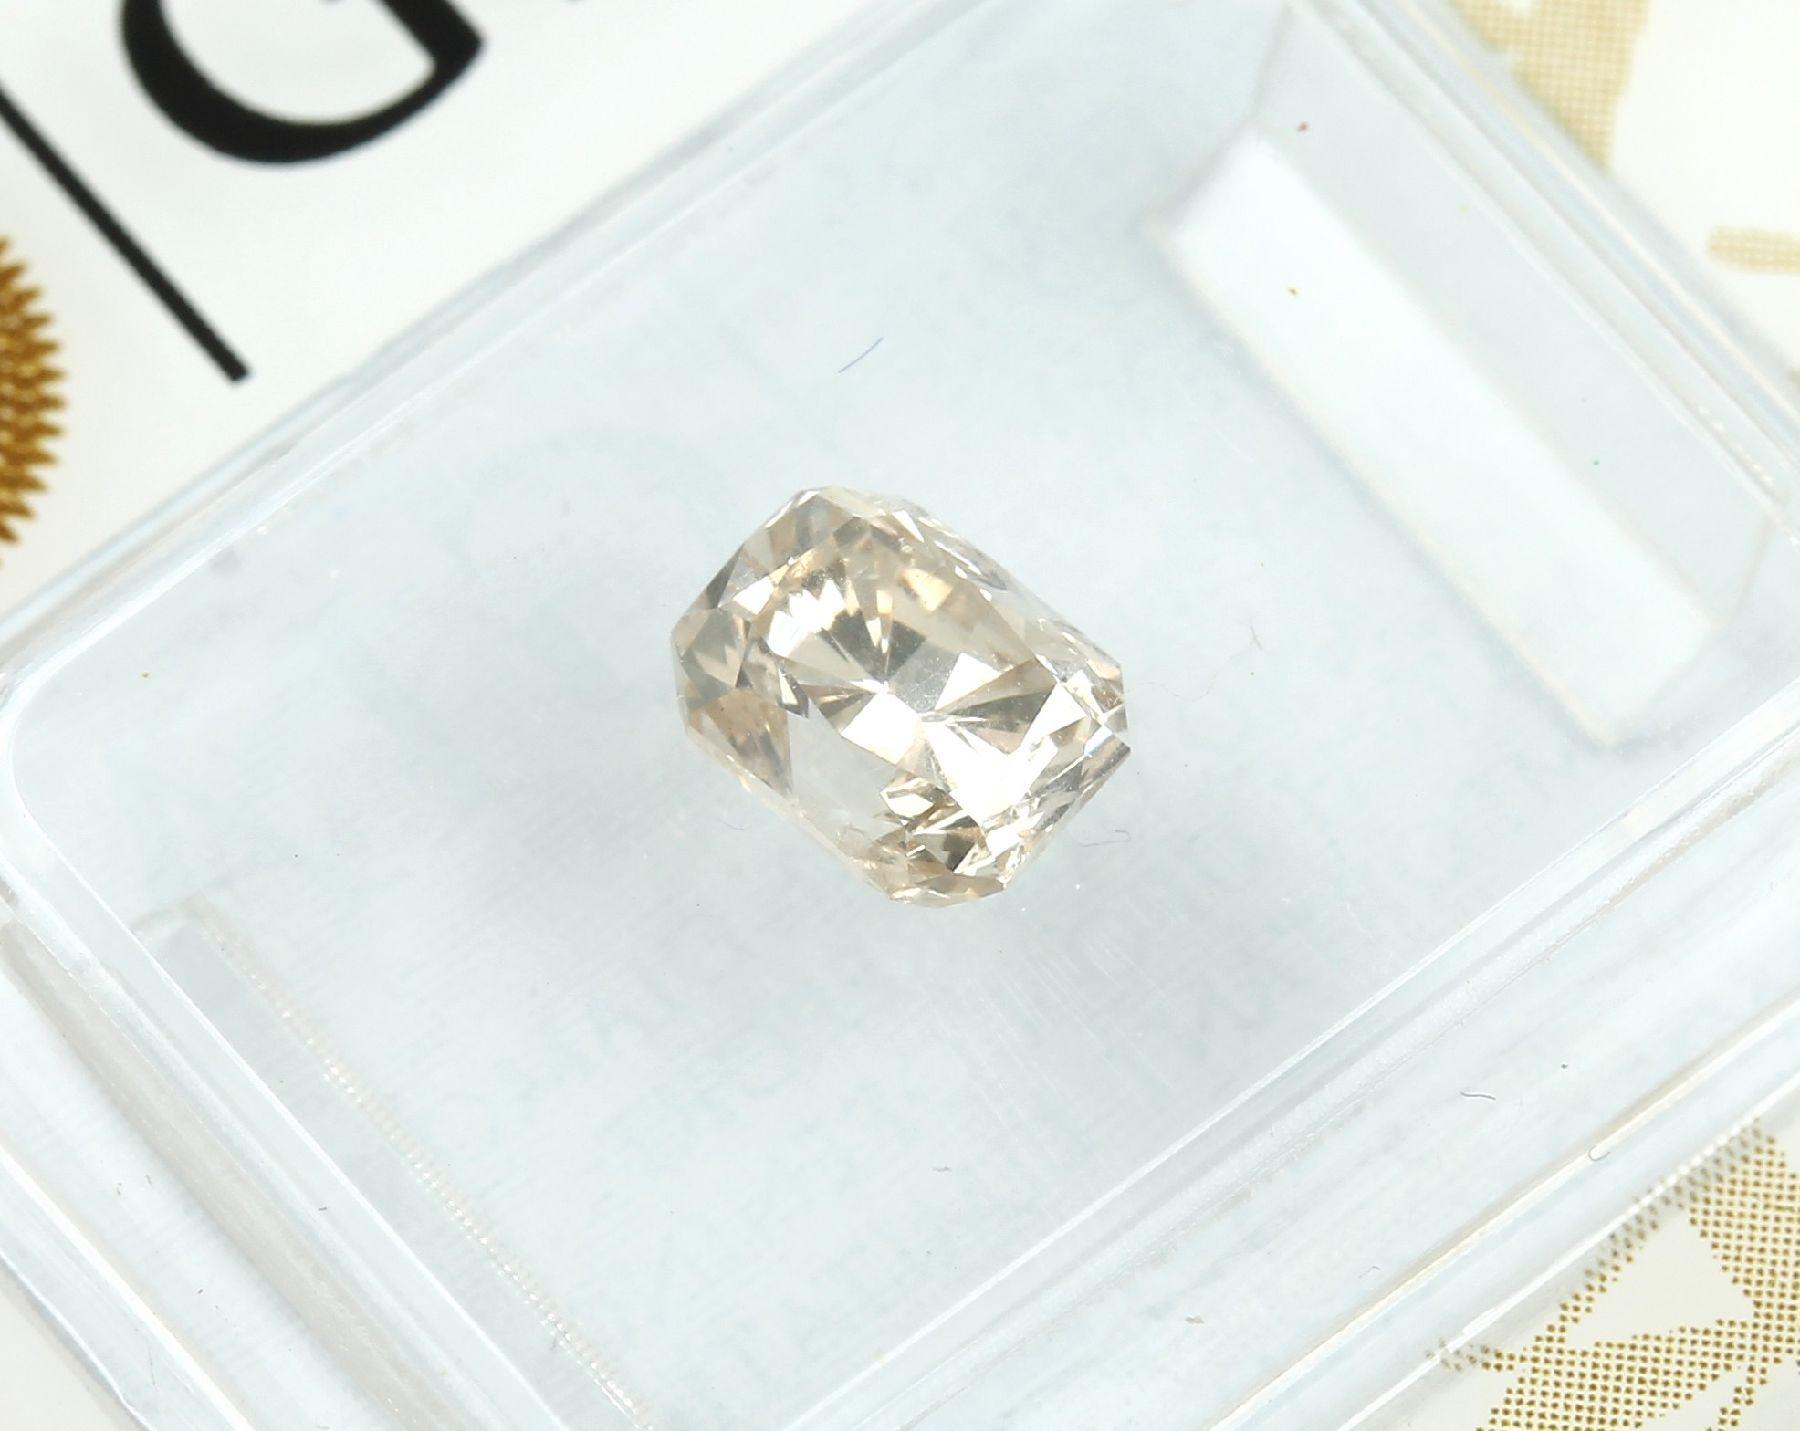 Loser Diamant, 0.91 ct Natural fancy light yellow-brown, rechteckig facett., 5.99 x 4.72 x 3.95 - Bild 2 aus 3